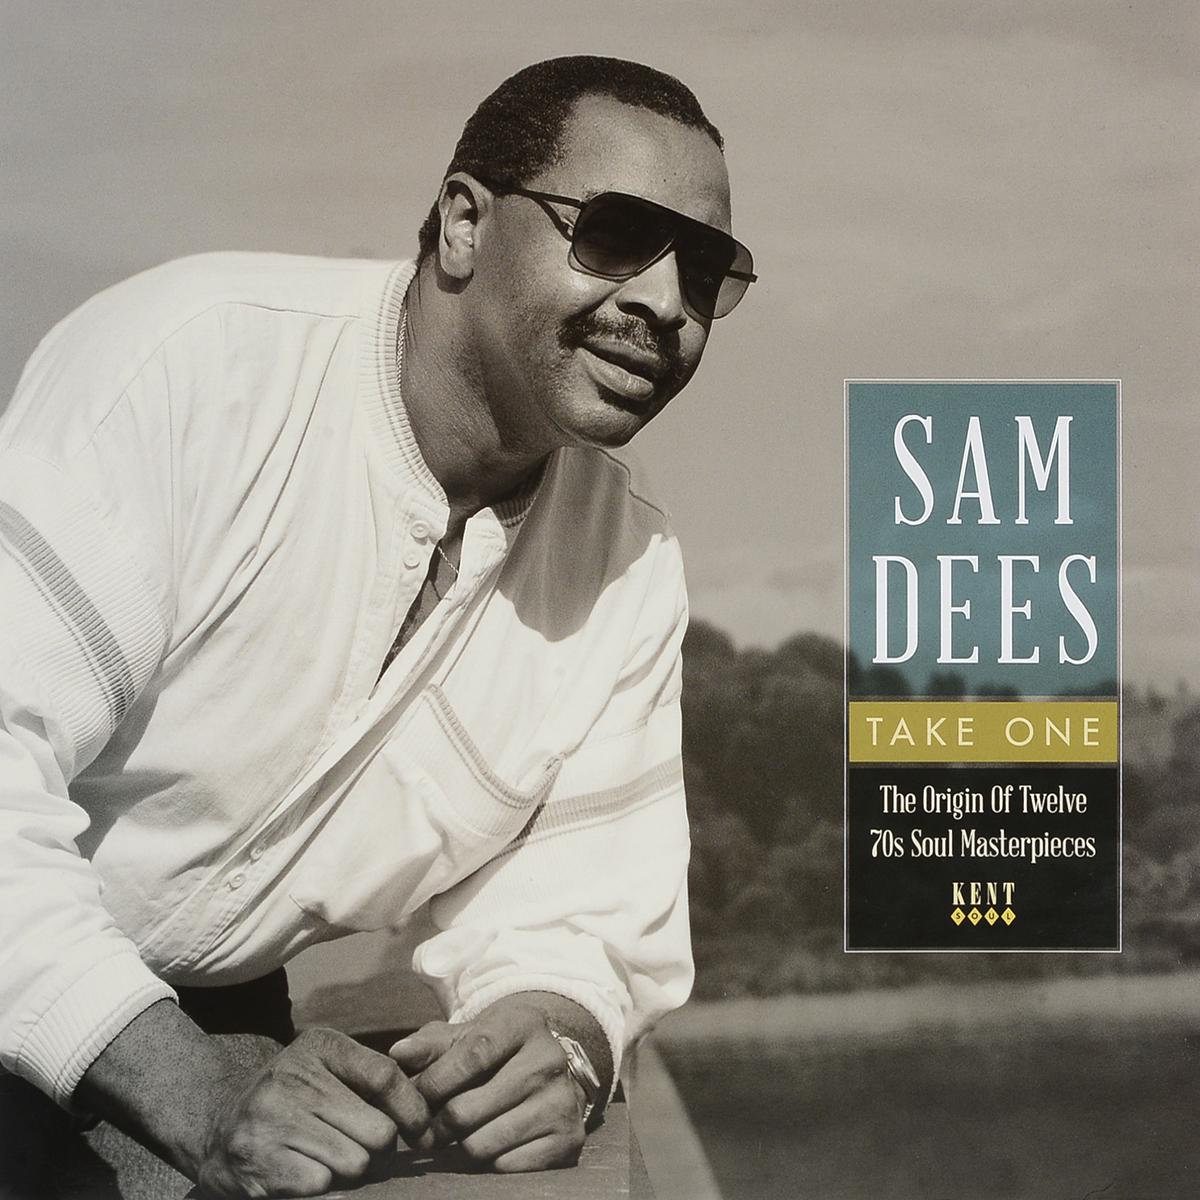 лучшая цена Сэм Дис Sam Dees - Take One. The Origin Of Twelve 70S Soul Masterpieces (LP)